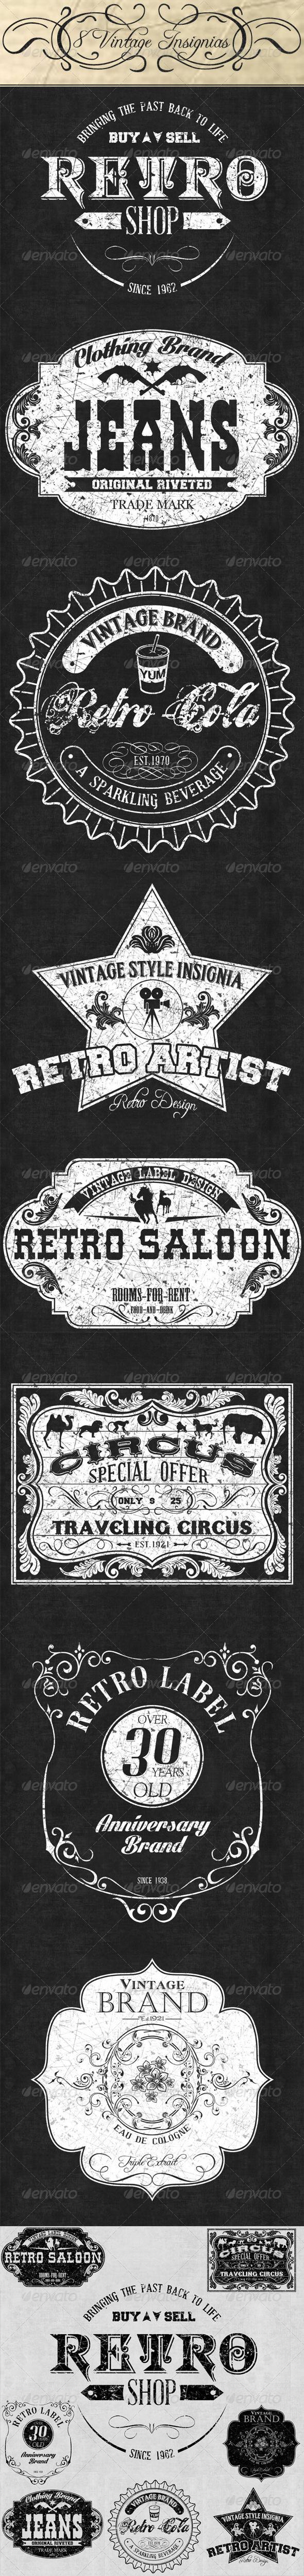 GraphicRiver 8 Retro Vintage Insignias Collection 6445102